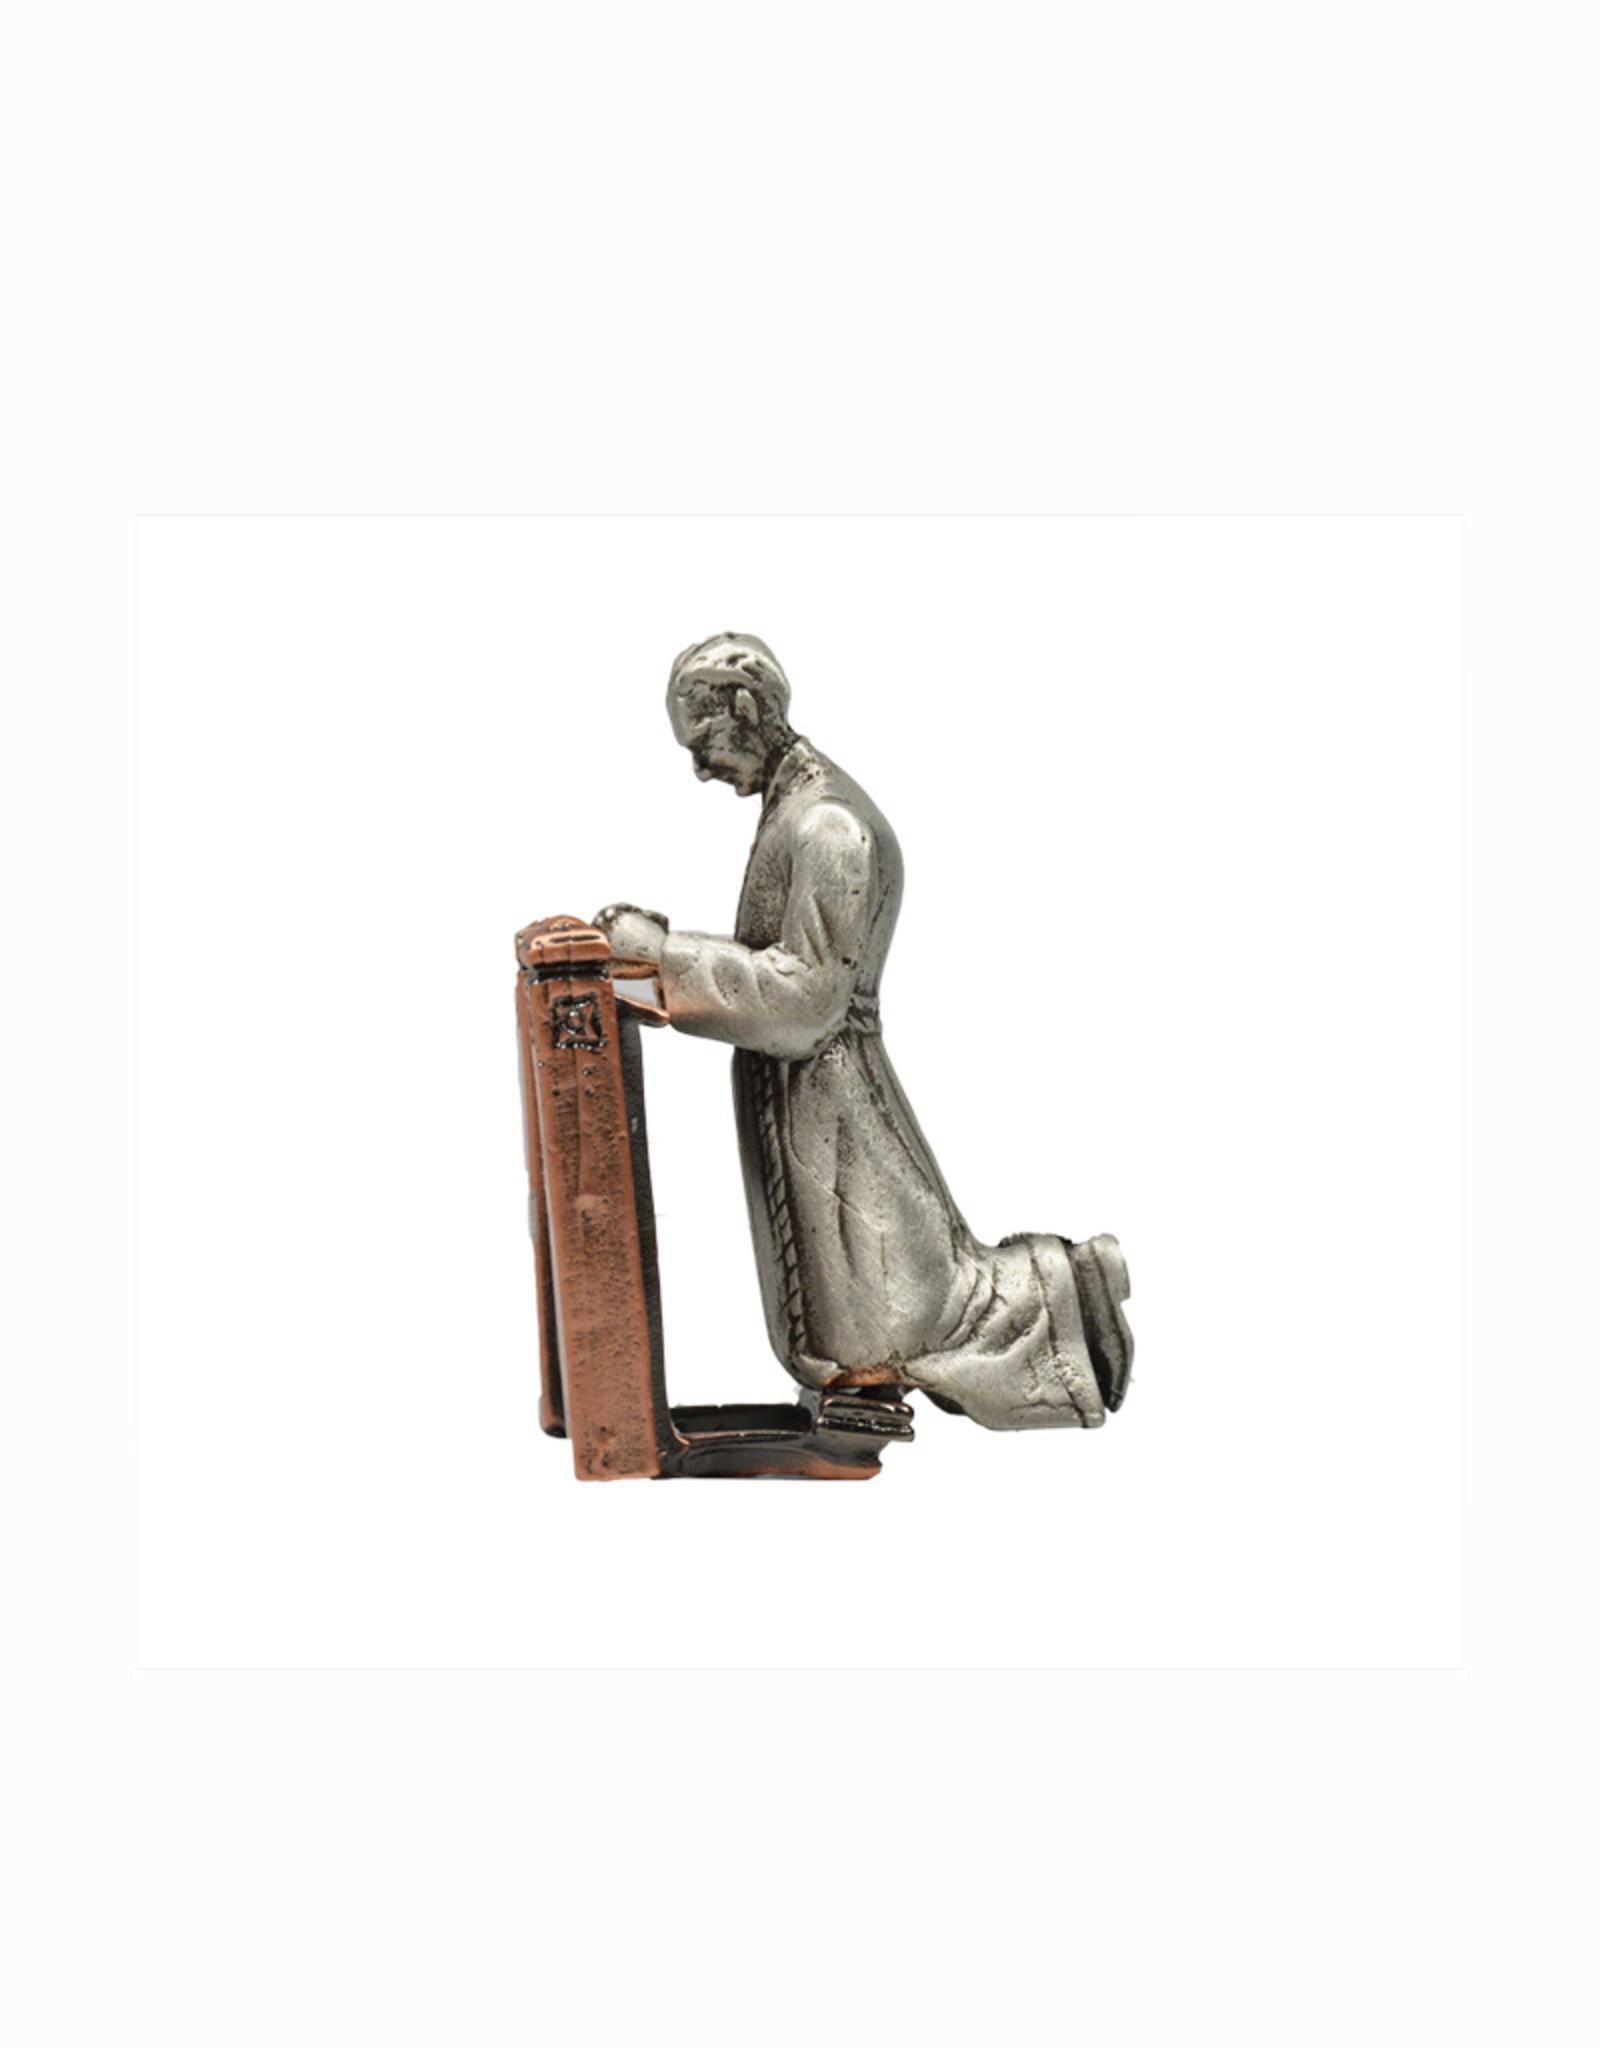 Statue Saint Brother André praying on kneeler